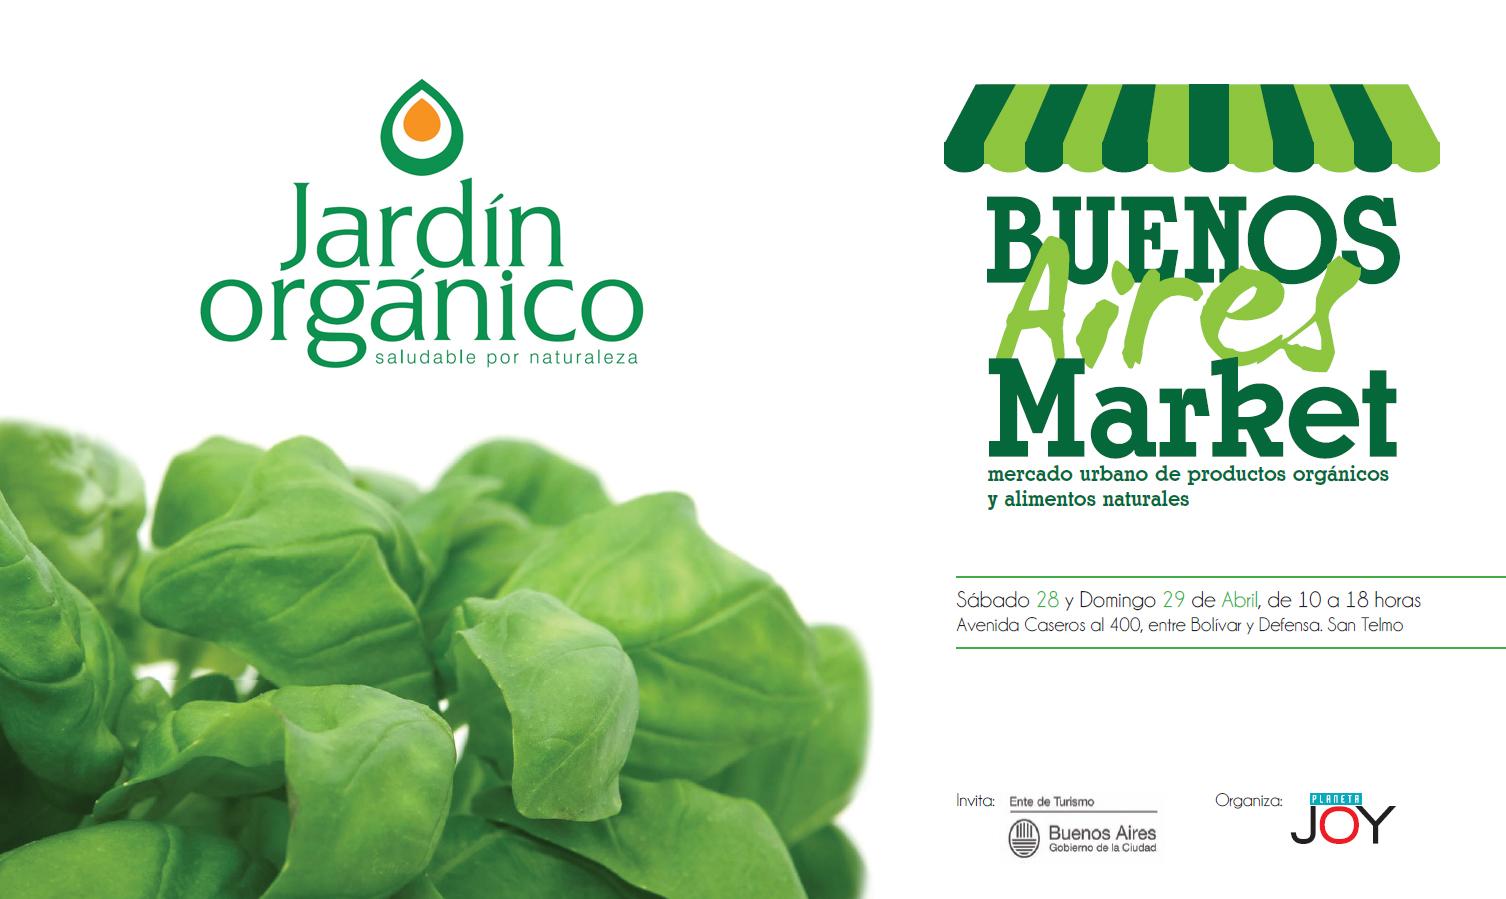 Jard n org nico en bs as market mundo flaneur for Jardin organico